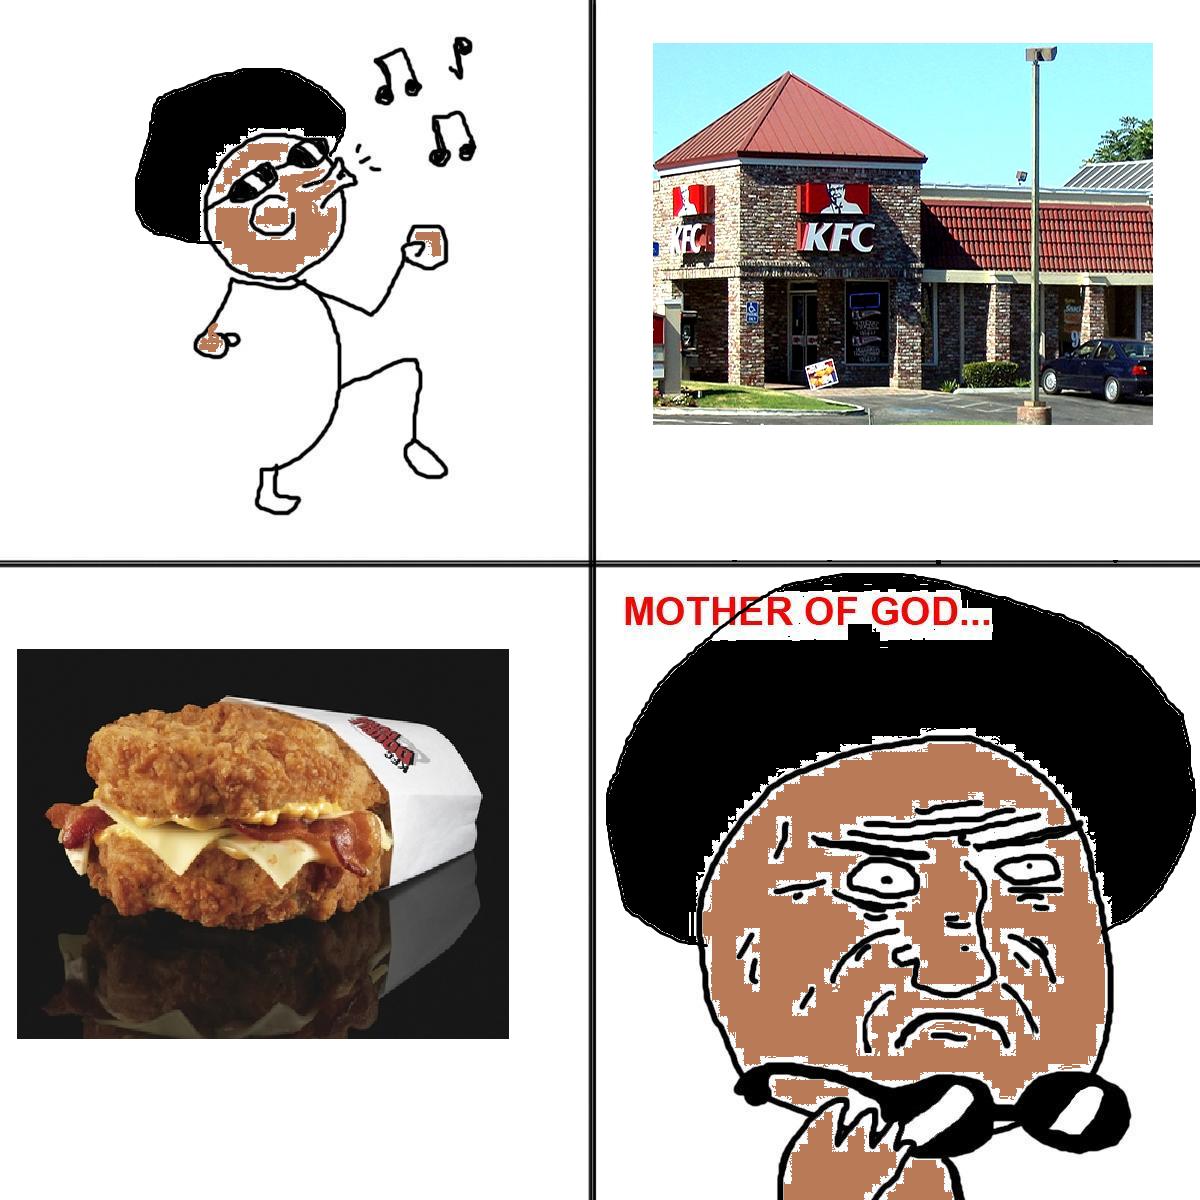 1286130474453 image 75069] mother of god know your meme,Meme Mother Of God